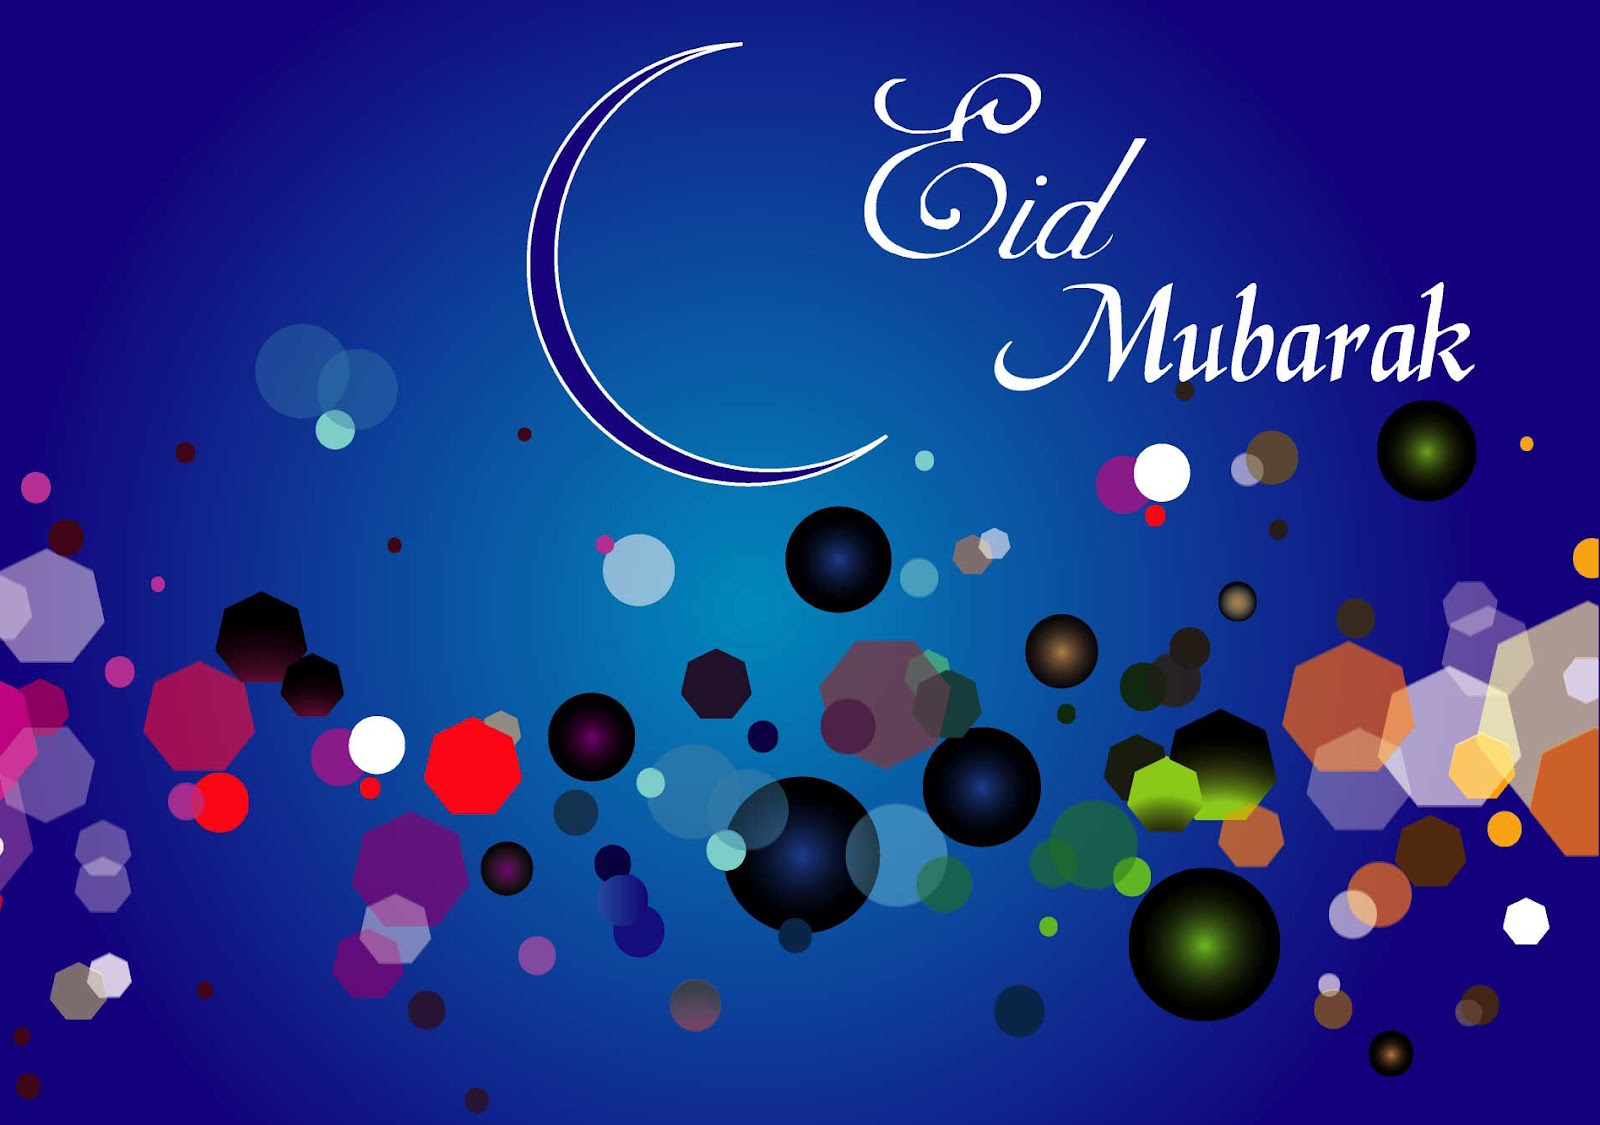 Hd wallpaper ramadhan 2017 - Eid Ul Fitr 2014 Hd Wallpapers Free Download